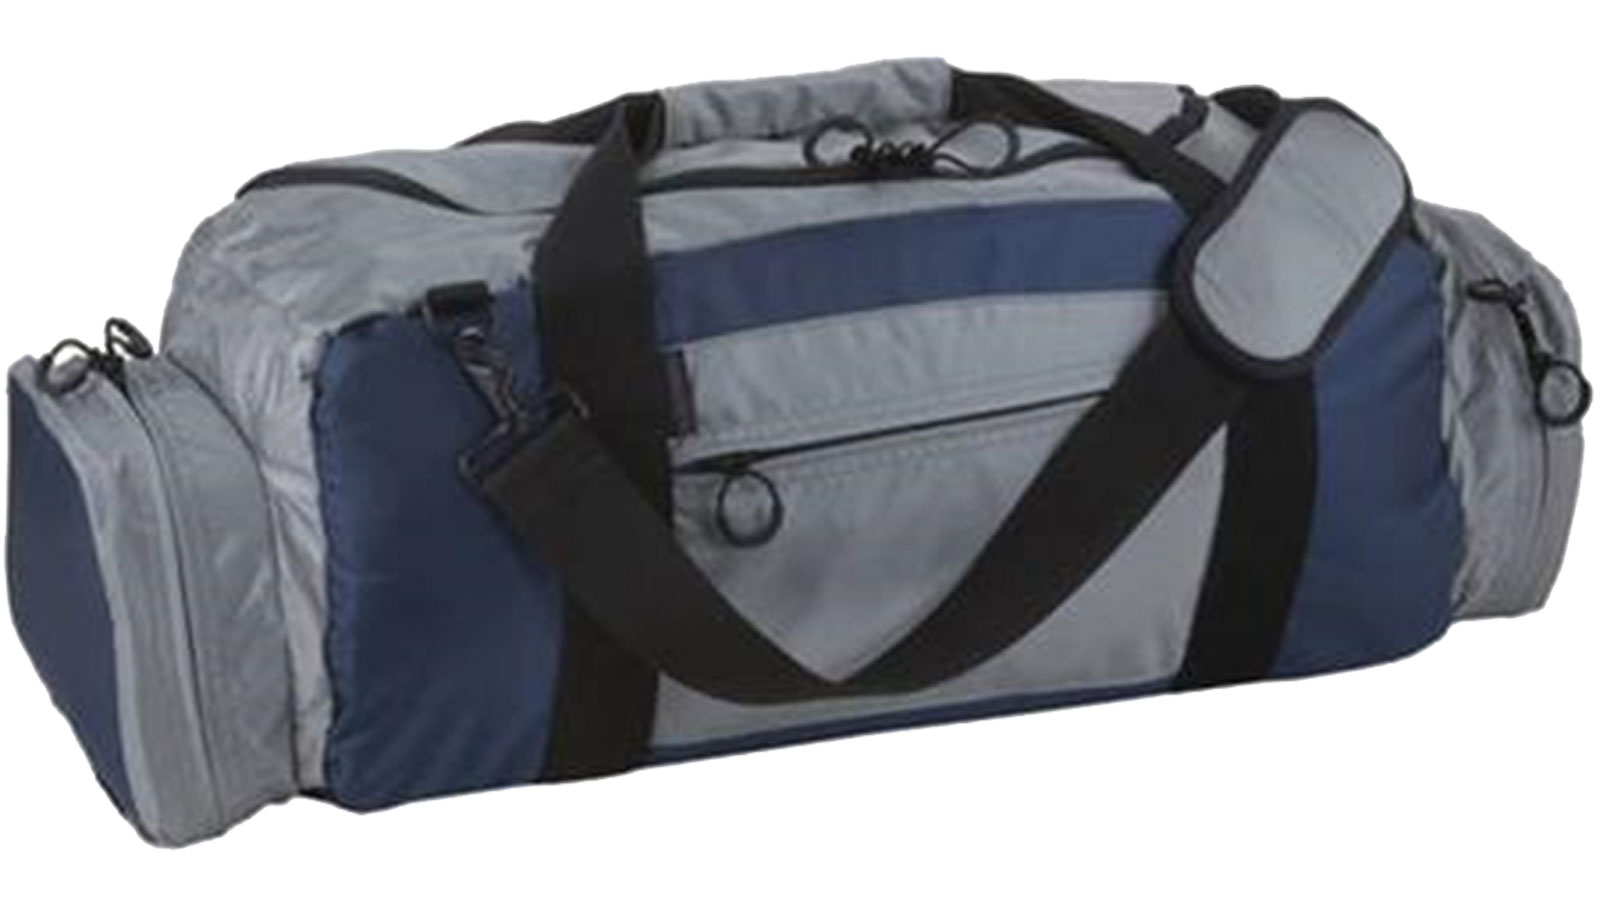 Blackhawk Diversion Workout Bag